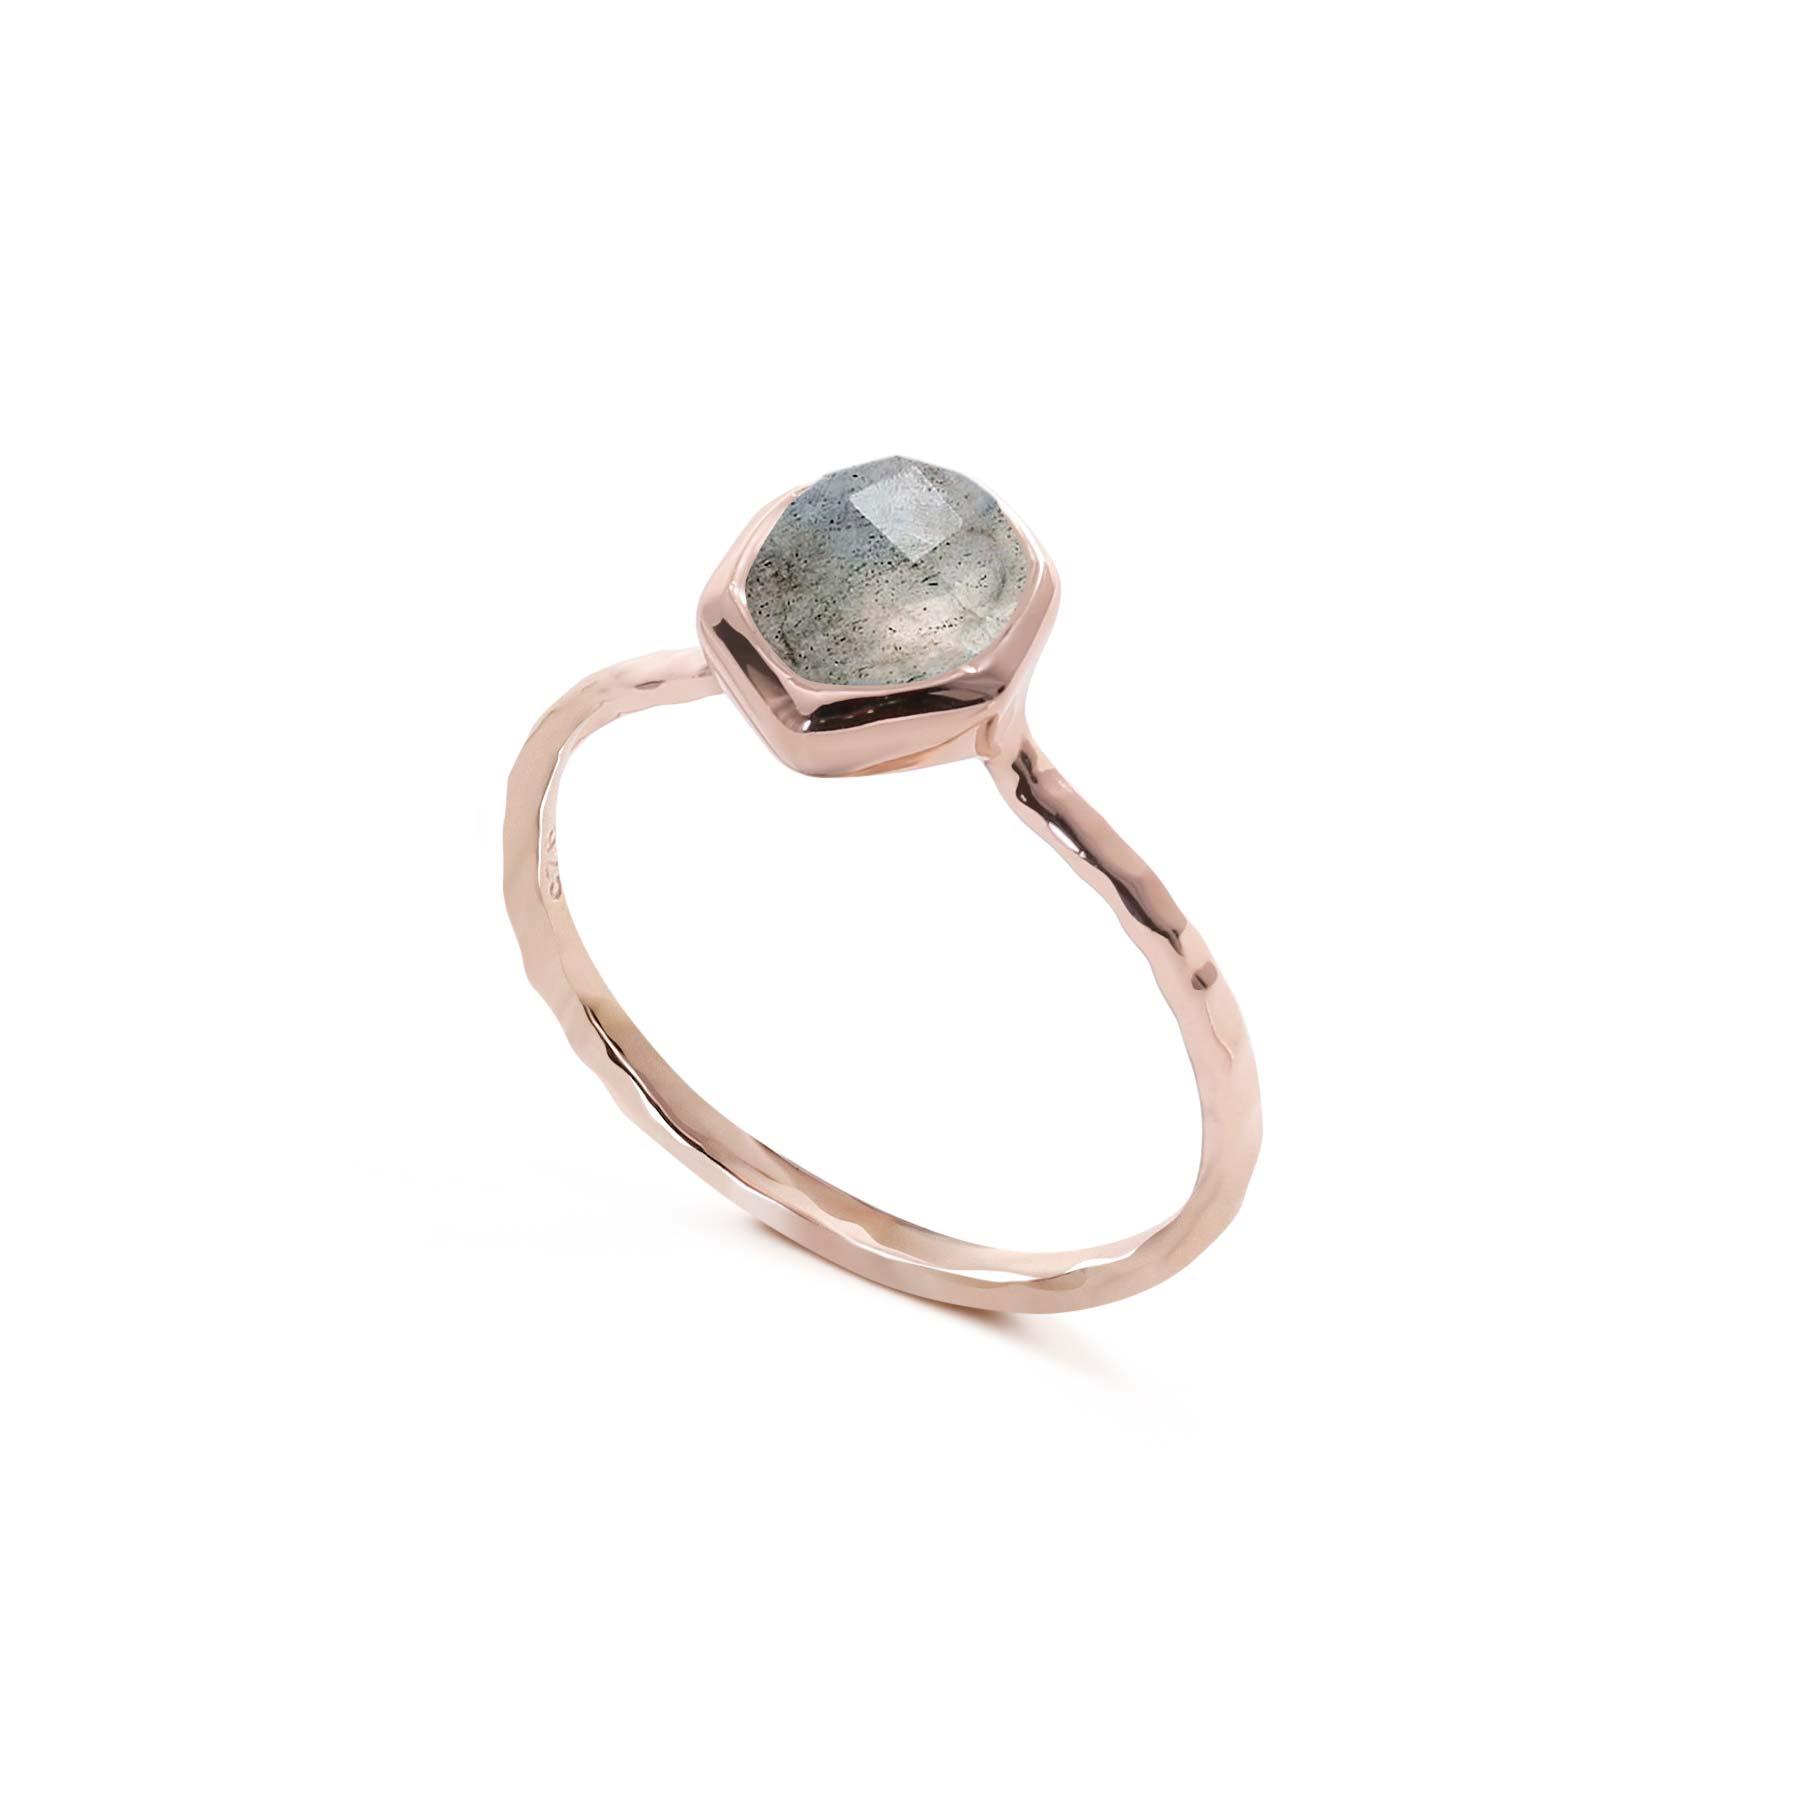 d59e4c73d3 Alluressories | Astoria Ring - Rose Gold - Labradorite